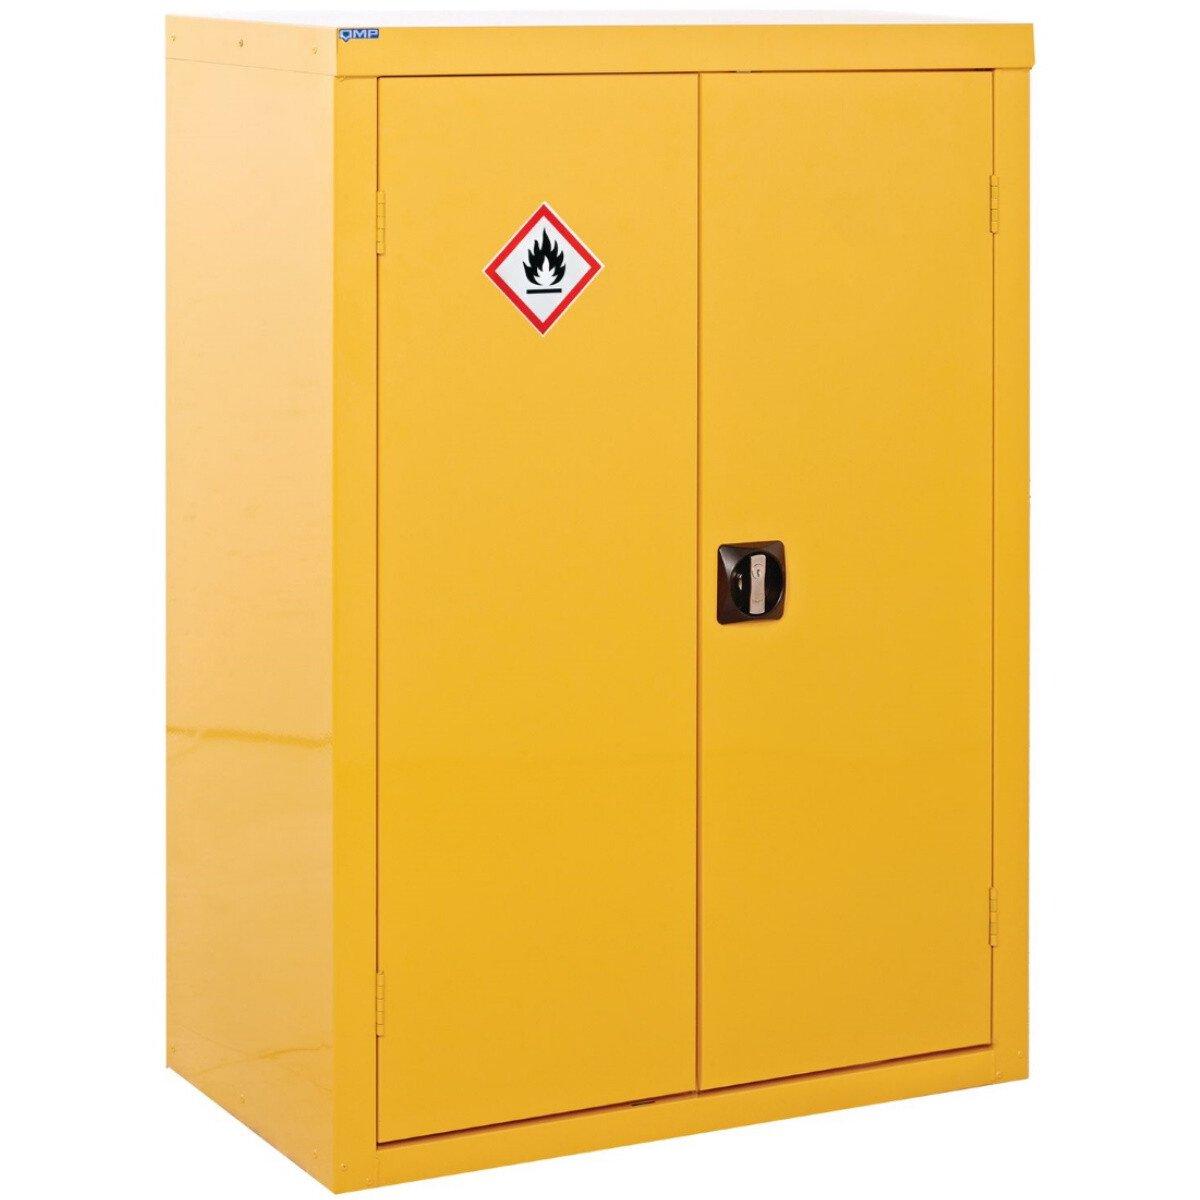 QMP CZ129046 Hazardous Substance Cupboard 1200 x 900 x 460mm